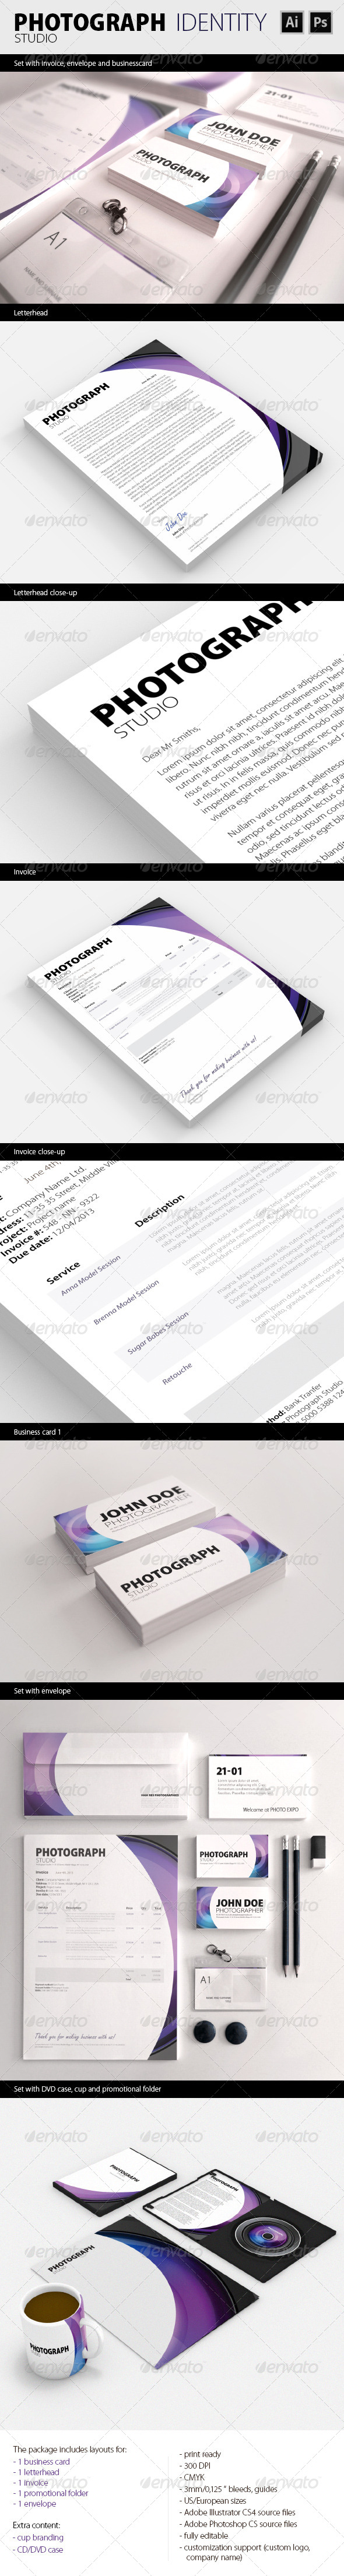 PhotoGraph Studio Corporate Identity